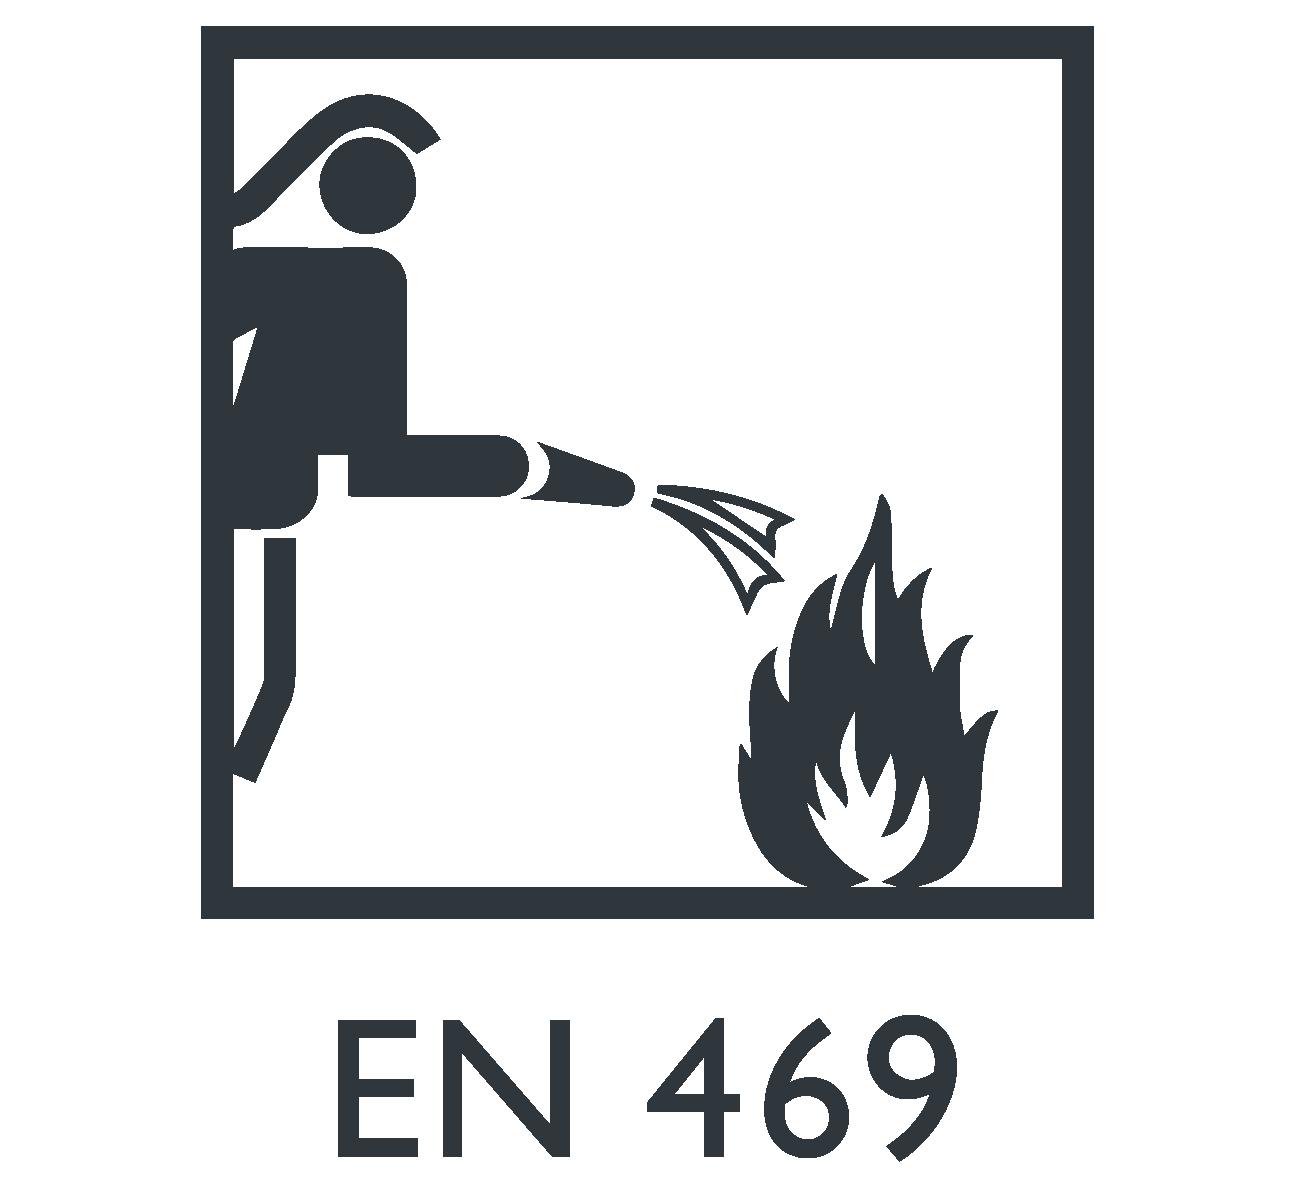 EN 469 Roupa de proteção para combate a incêndios Marina Textil